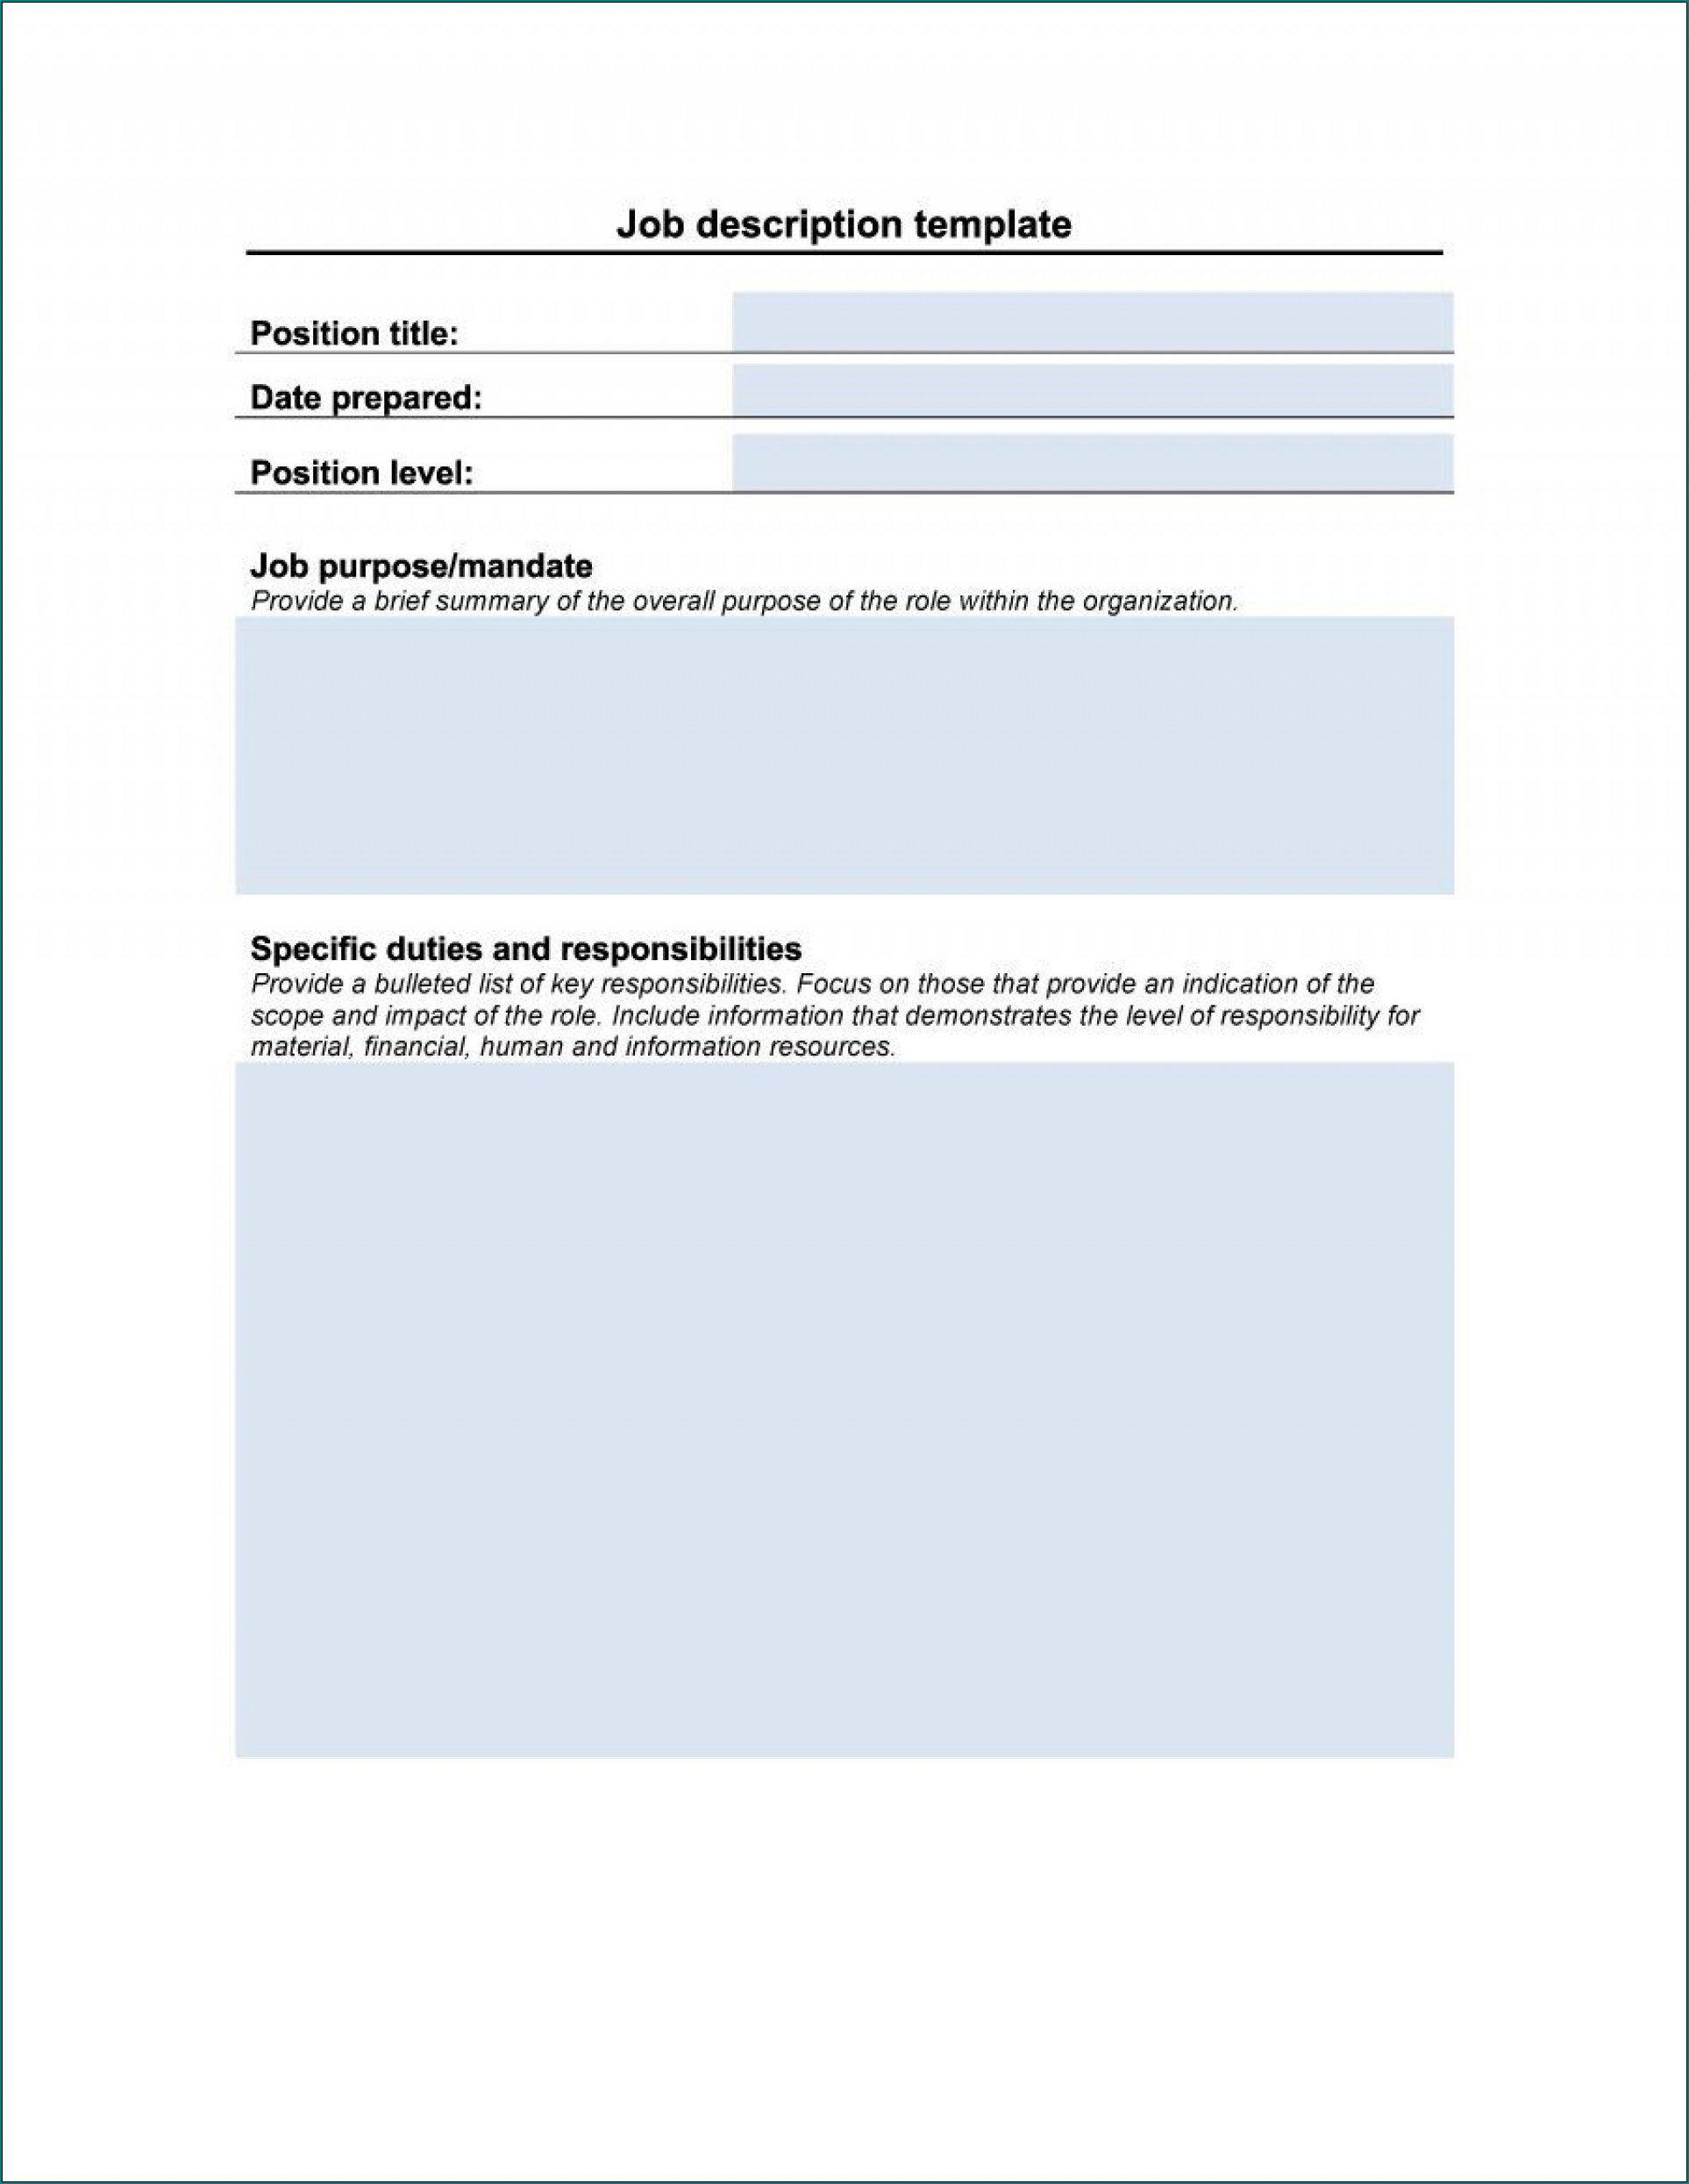 Example of Job Description Template Word